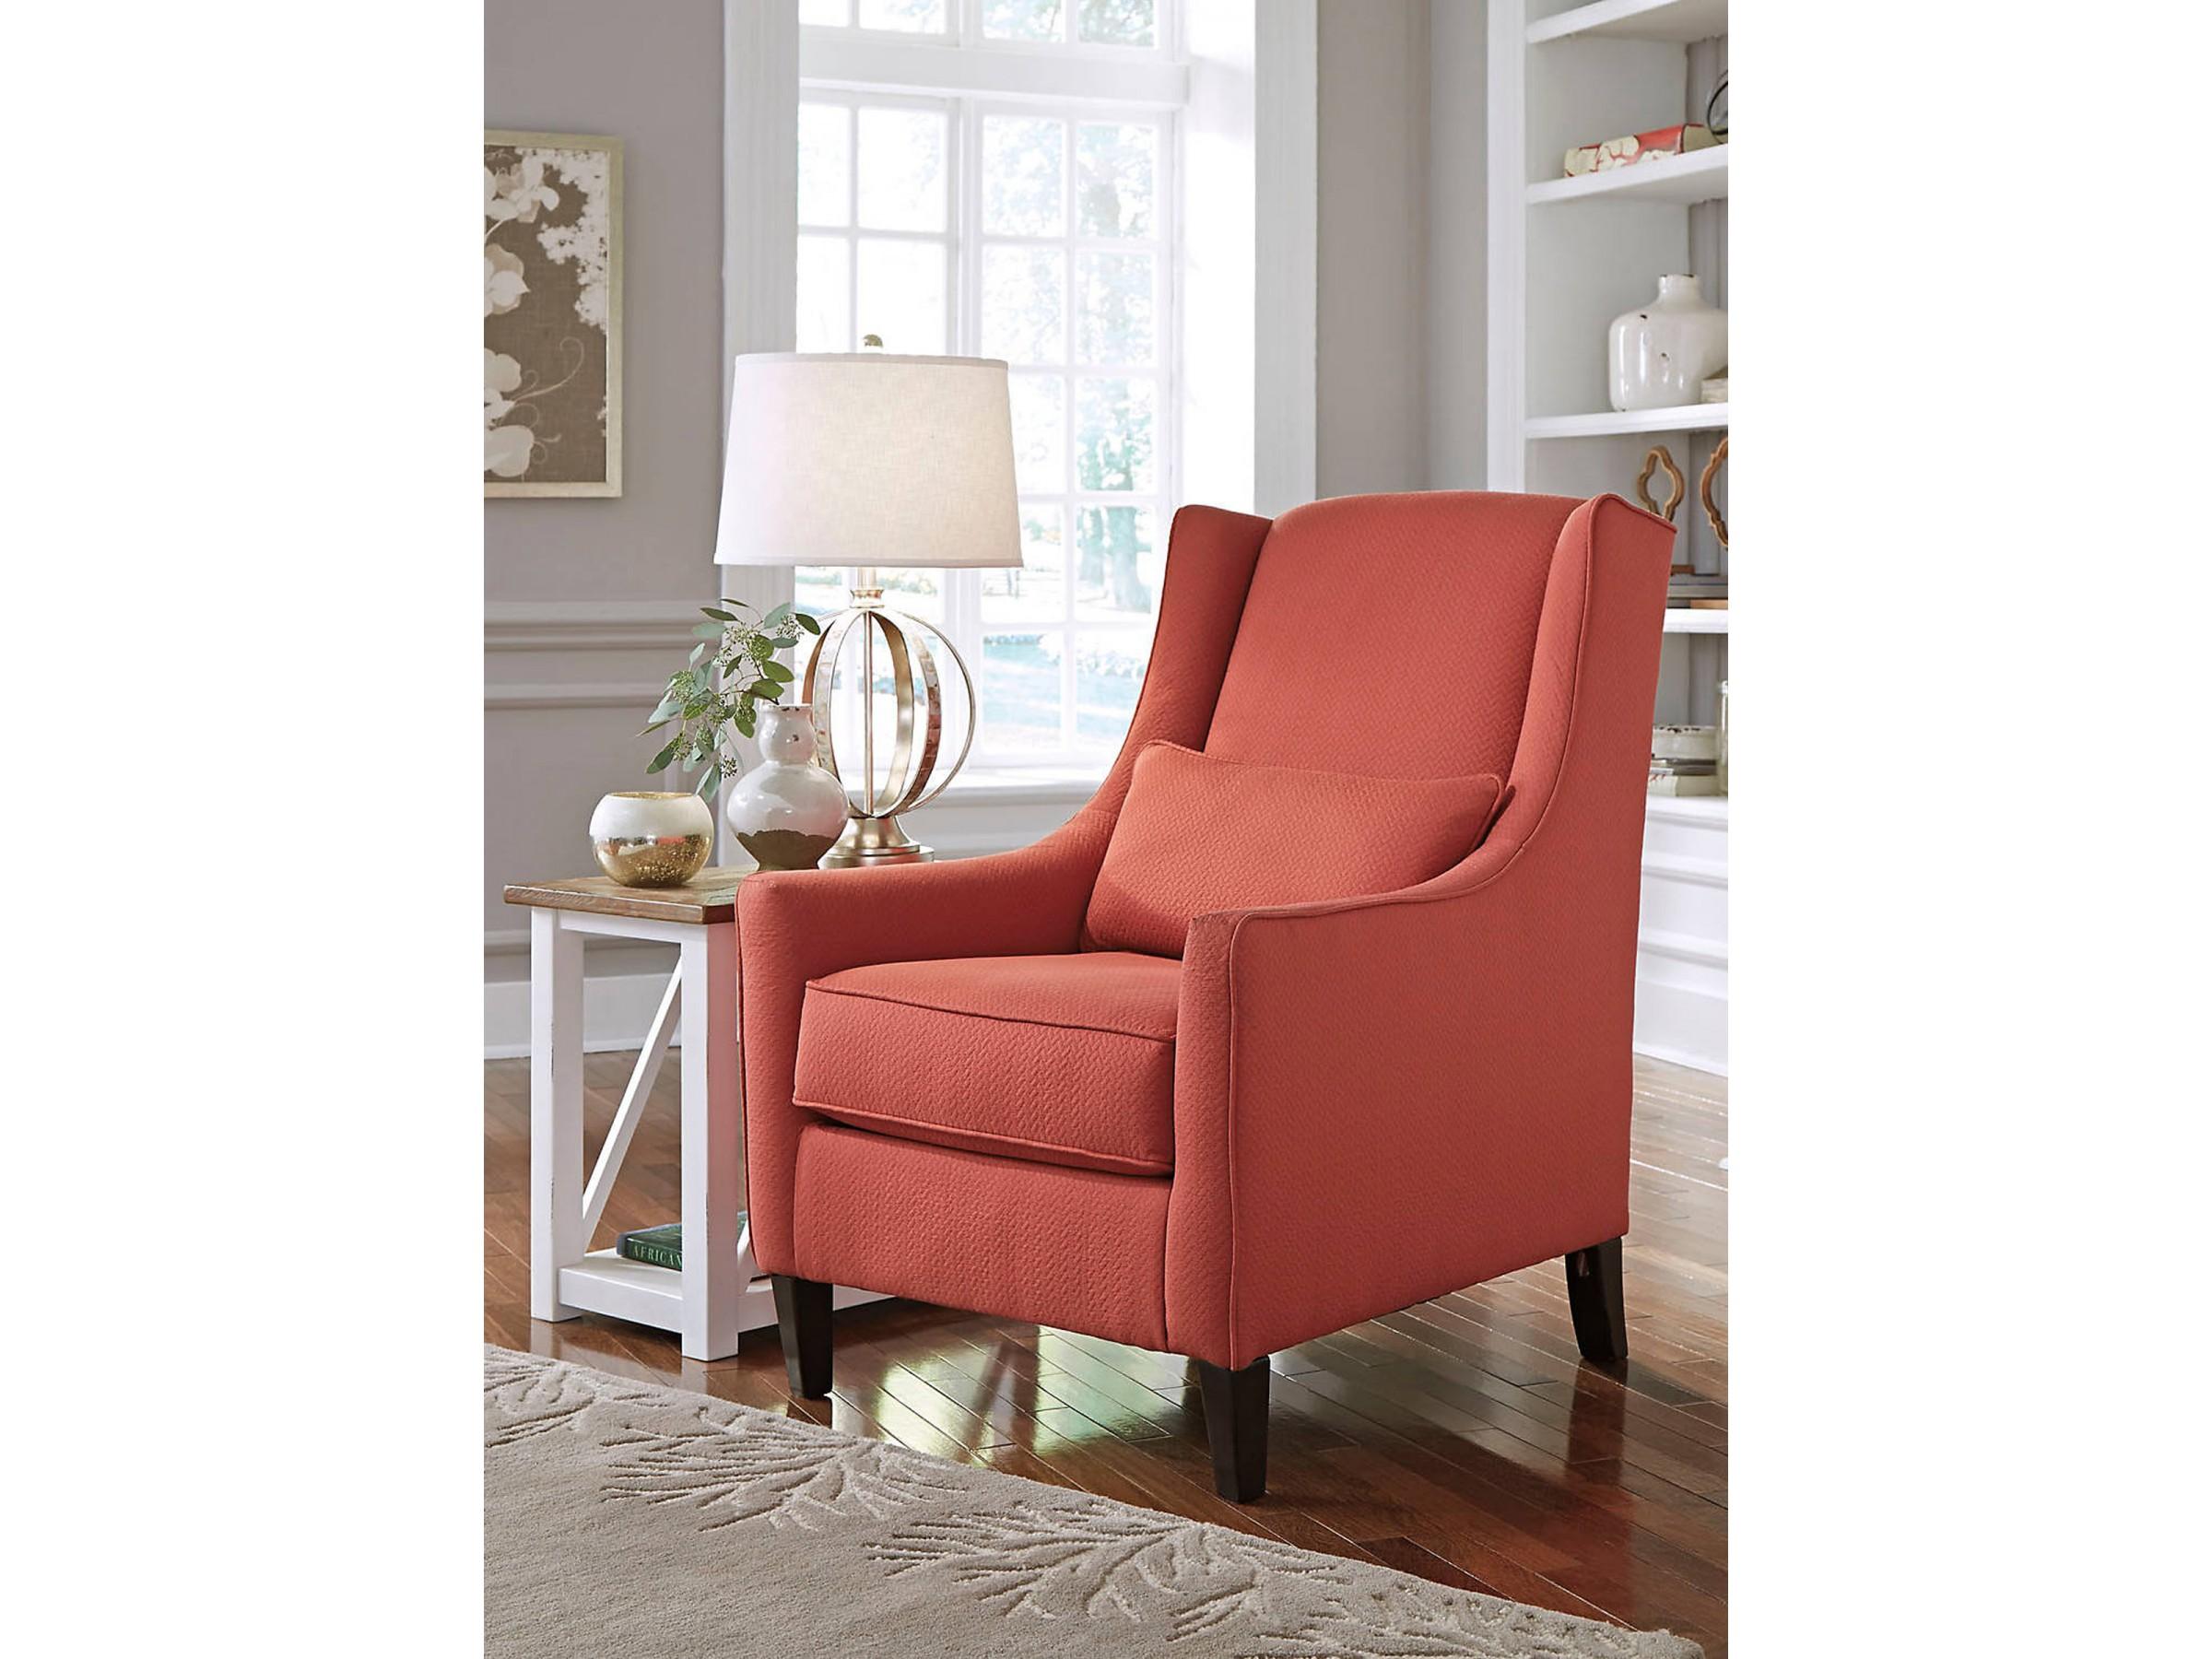 Swell Sansimeon Cinnamon Accent Chair Short Links Chair Design For Home Short Linksinfo